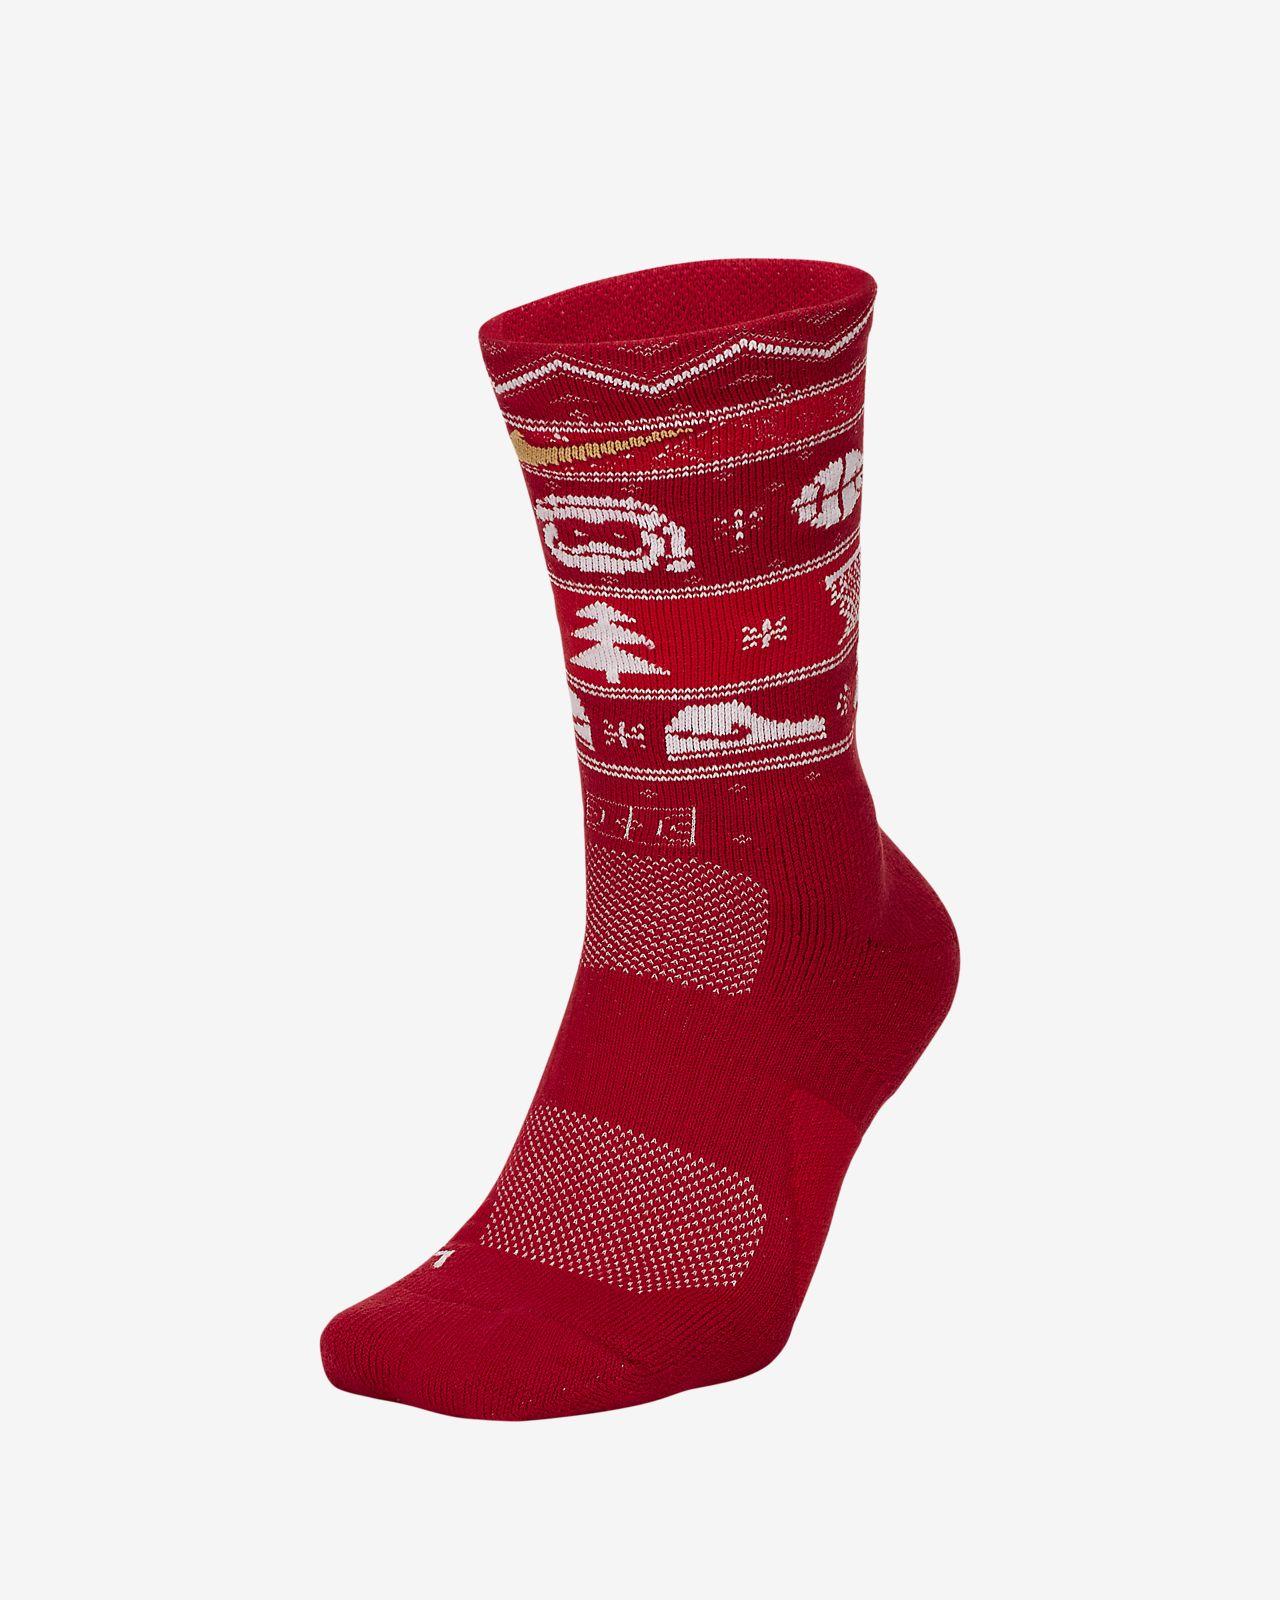 Nike Elite Christmas Crew Socks